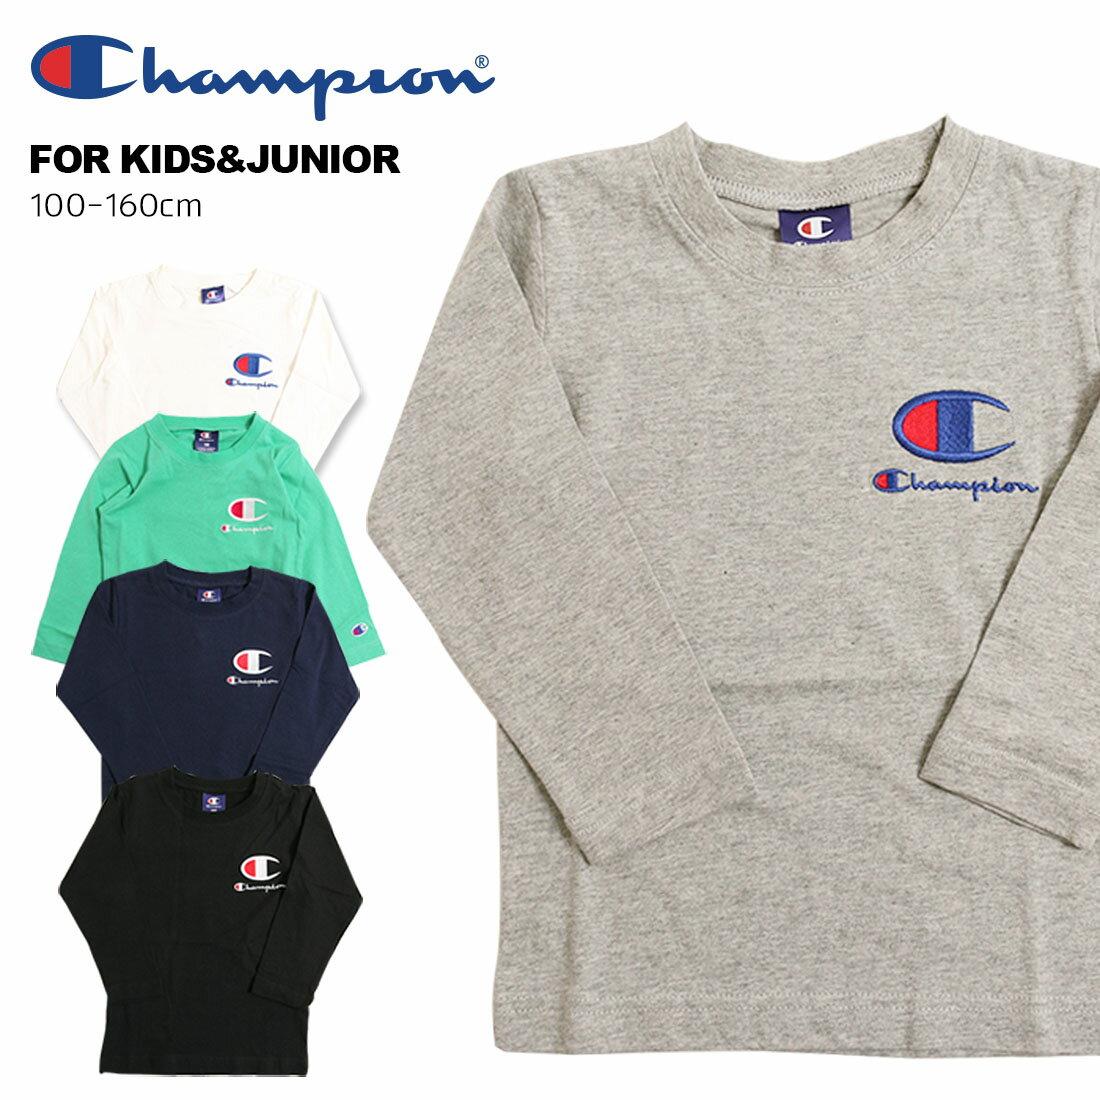 Champion チャンピオン CX6828 CX7104 CX6980 CX6593 長袖Tシャツ(100cm 110cm 120cm 130cm 140cm 150cm 160cm)【メール便可】